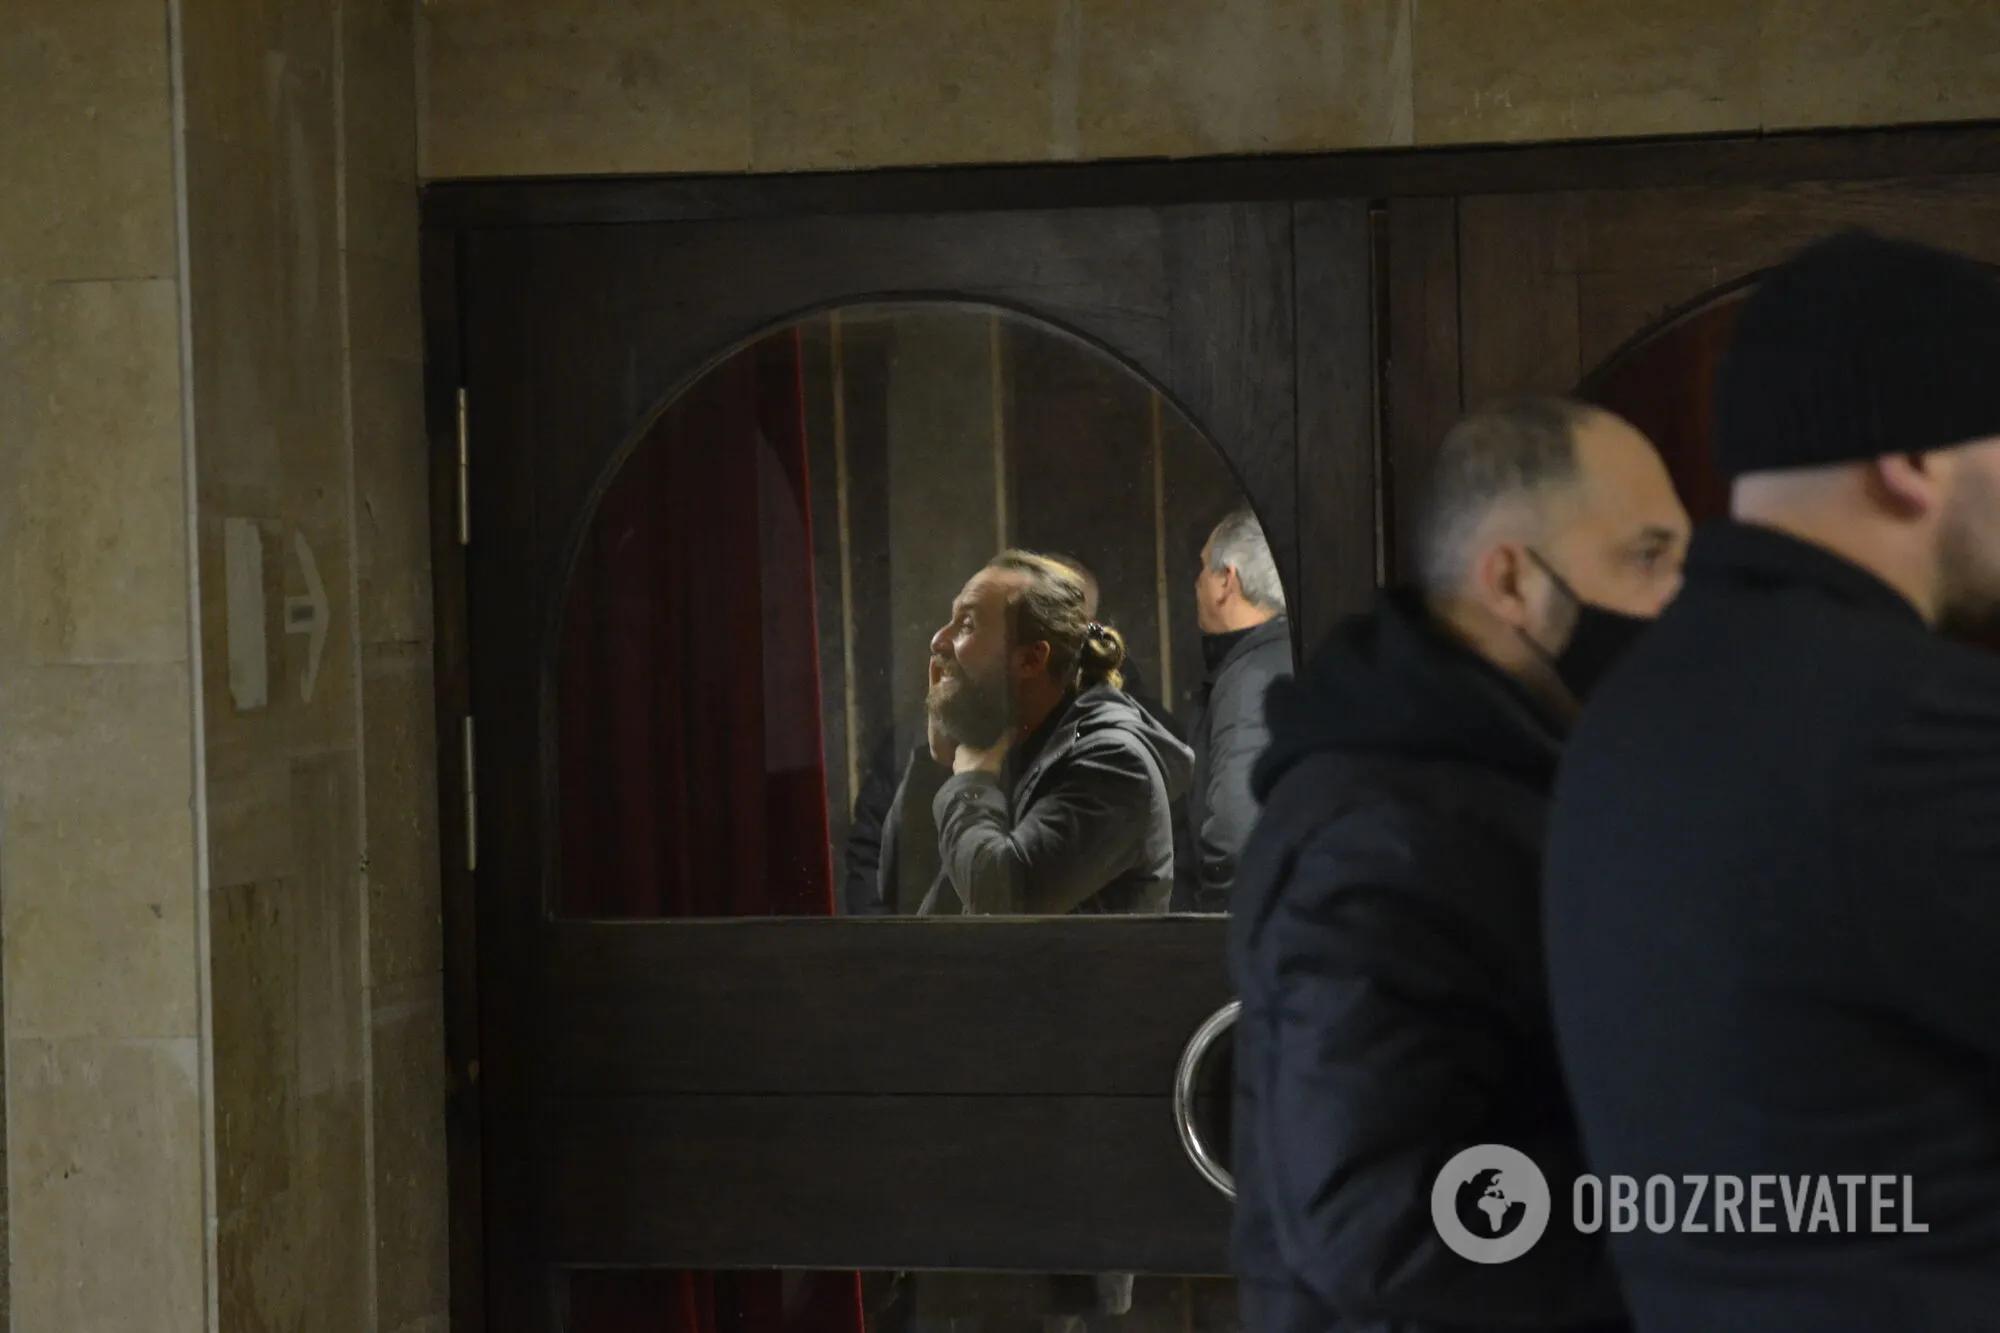 Син Кернеса Кирило,, похорон Кернеса, Харків